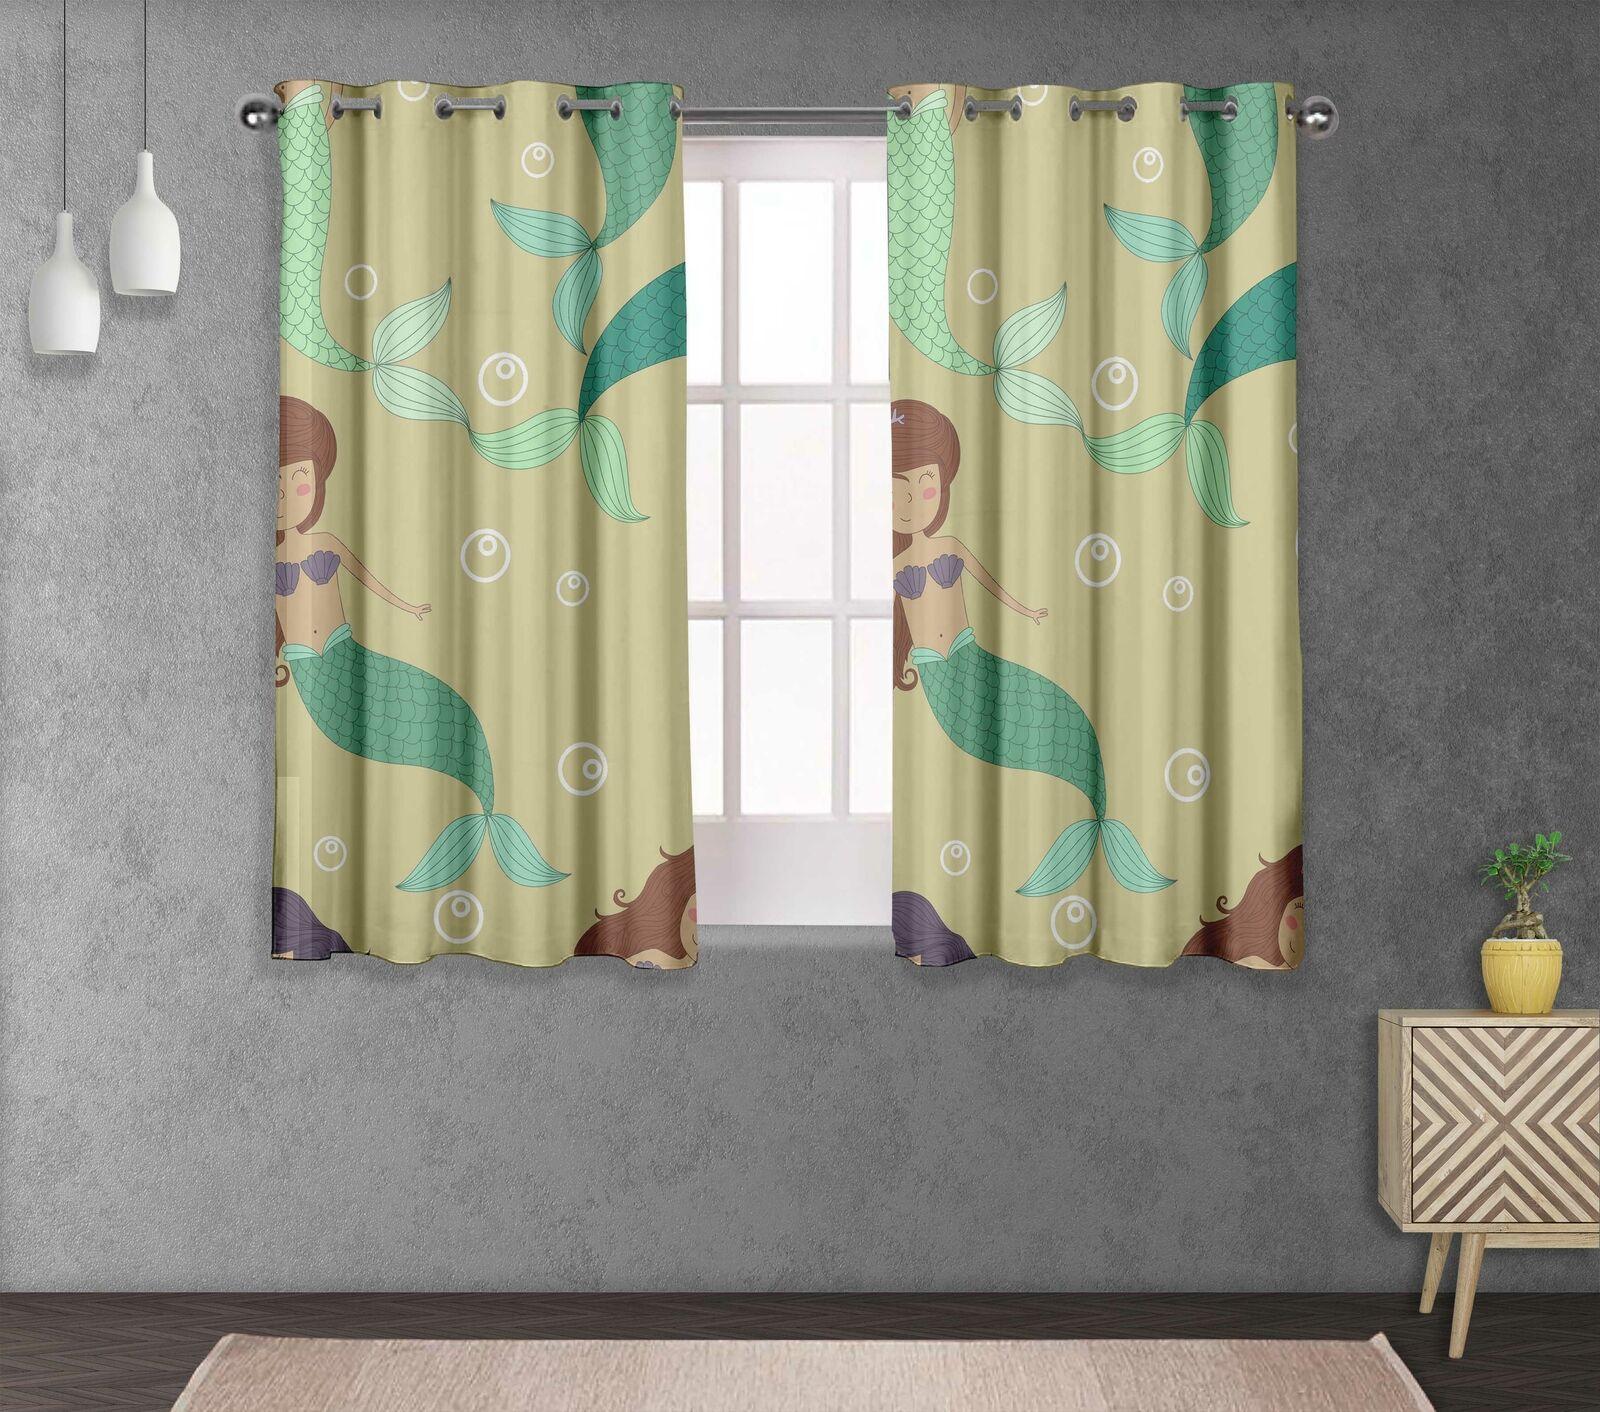 S4sassy Bubbles & Mermaid Double Panel Window Treatment Curtain -OC-562H